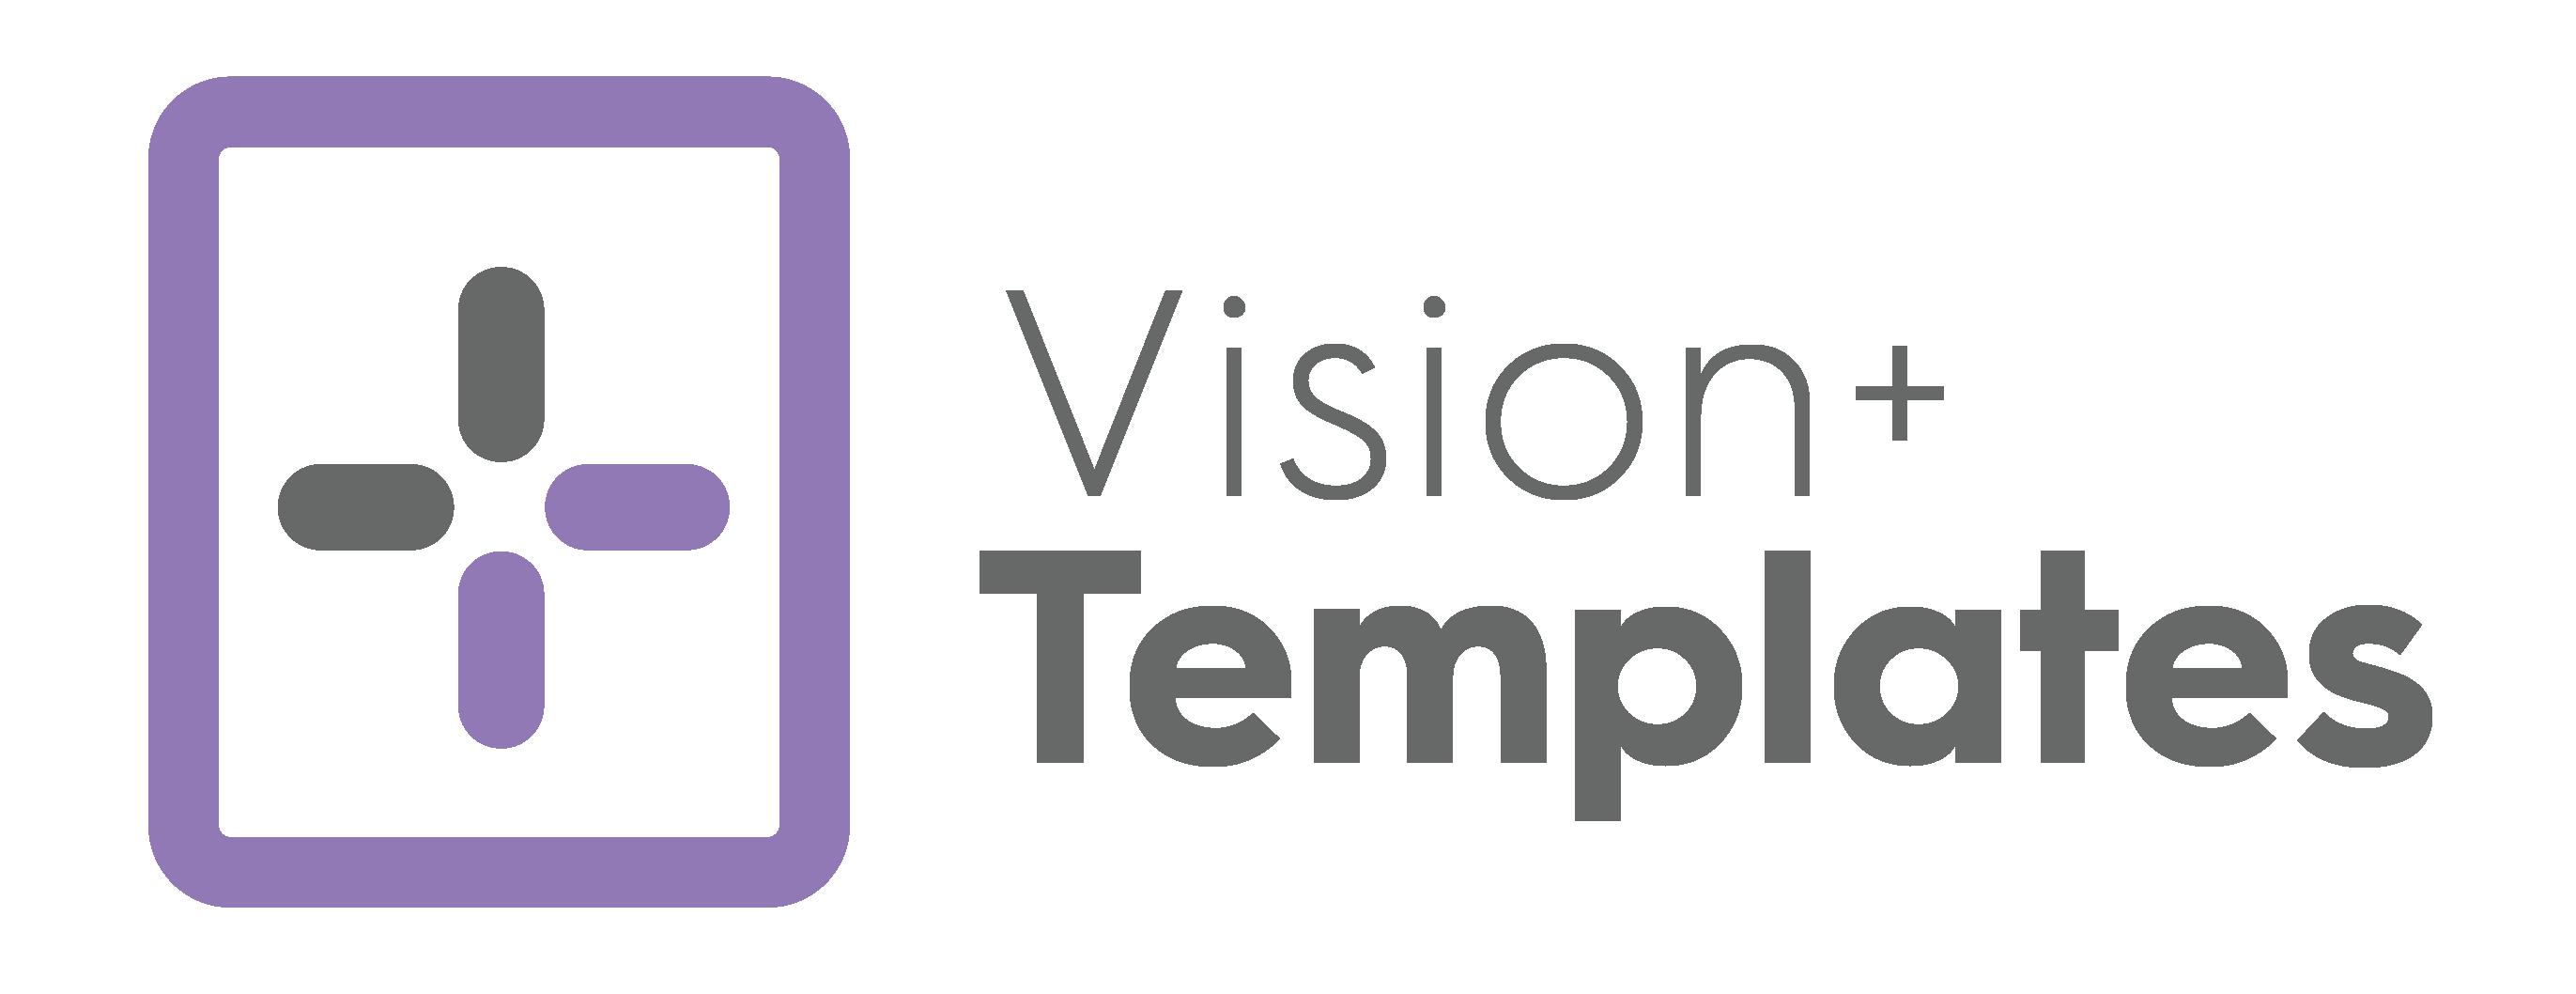 Vision Plus Templates logo